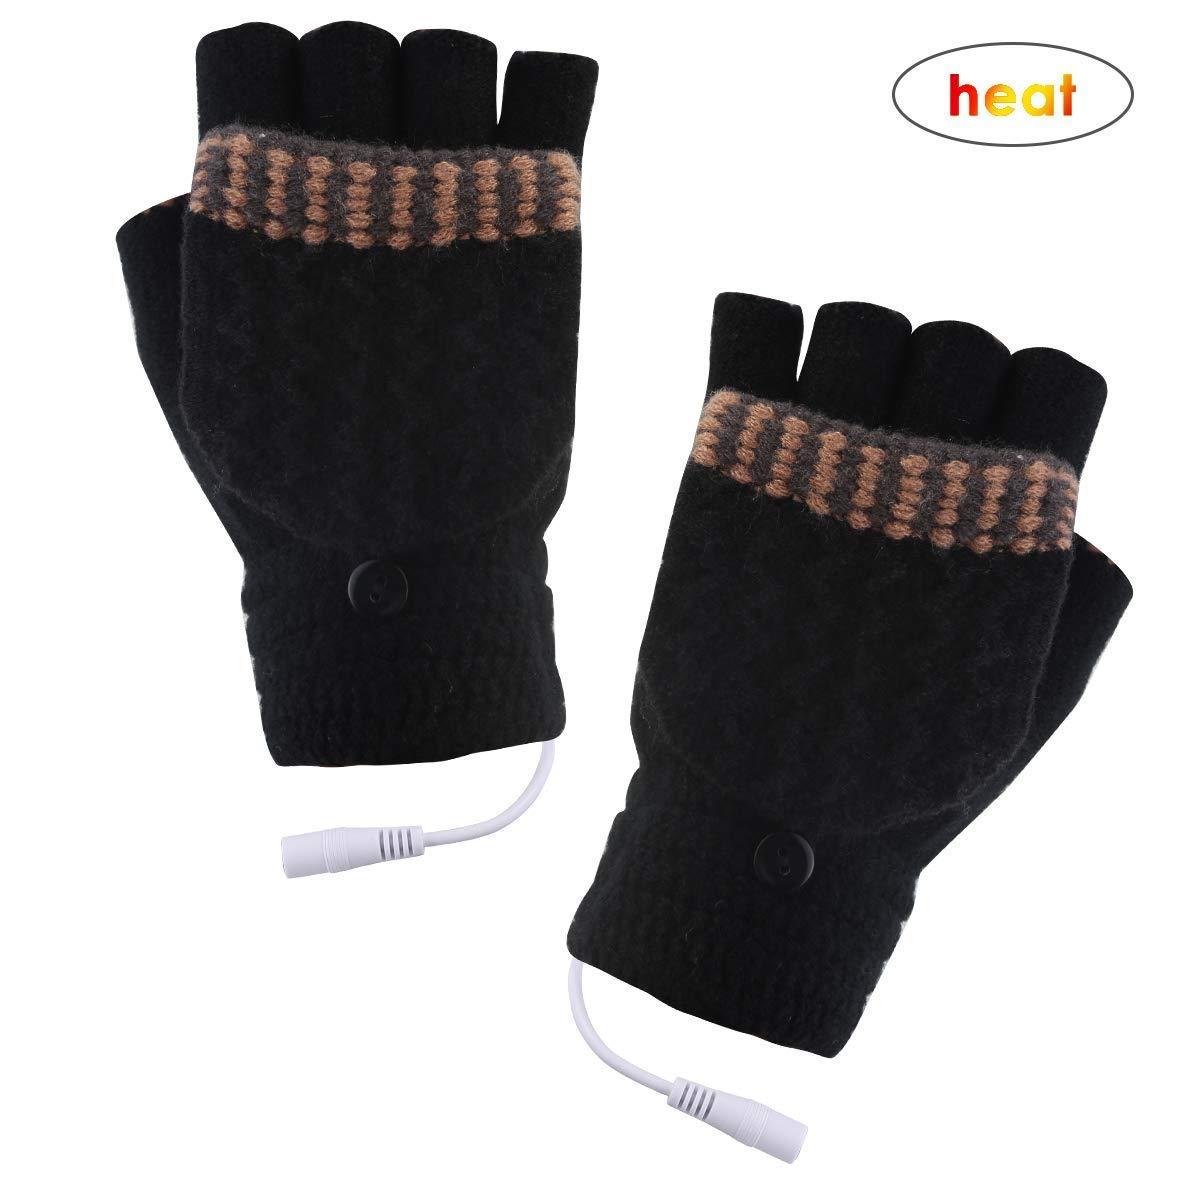 Azyuan USB Heated Gloves, Warm Wool Winter Laptop Gloves, Full & Half Heated Fingerless Heating Gloves, Knitting Hands Warmer, Washable Design (men-dark grey)